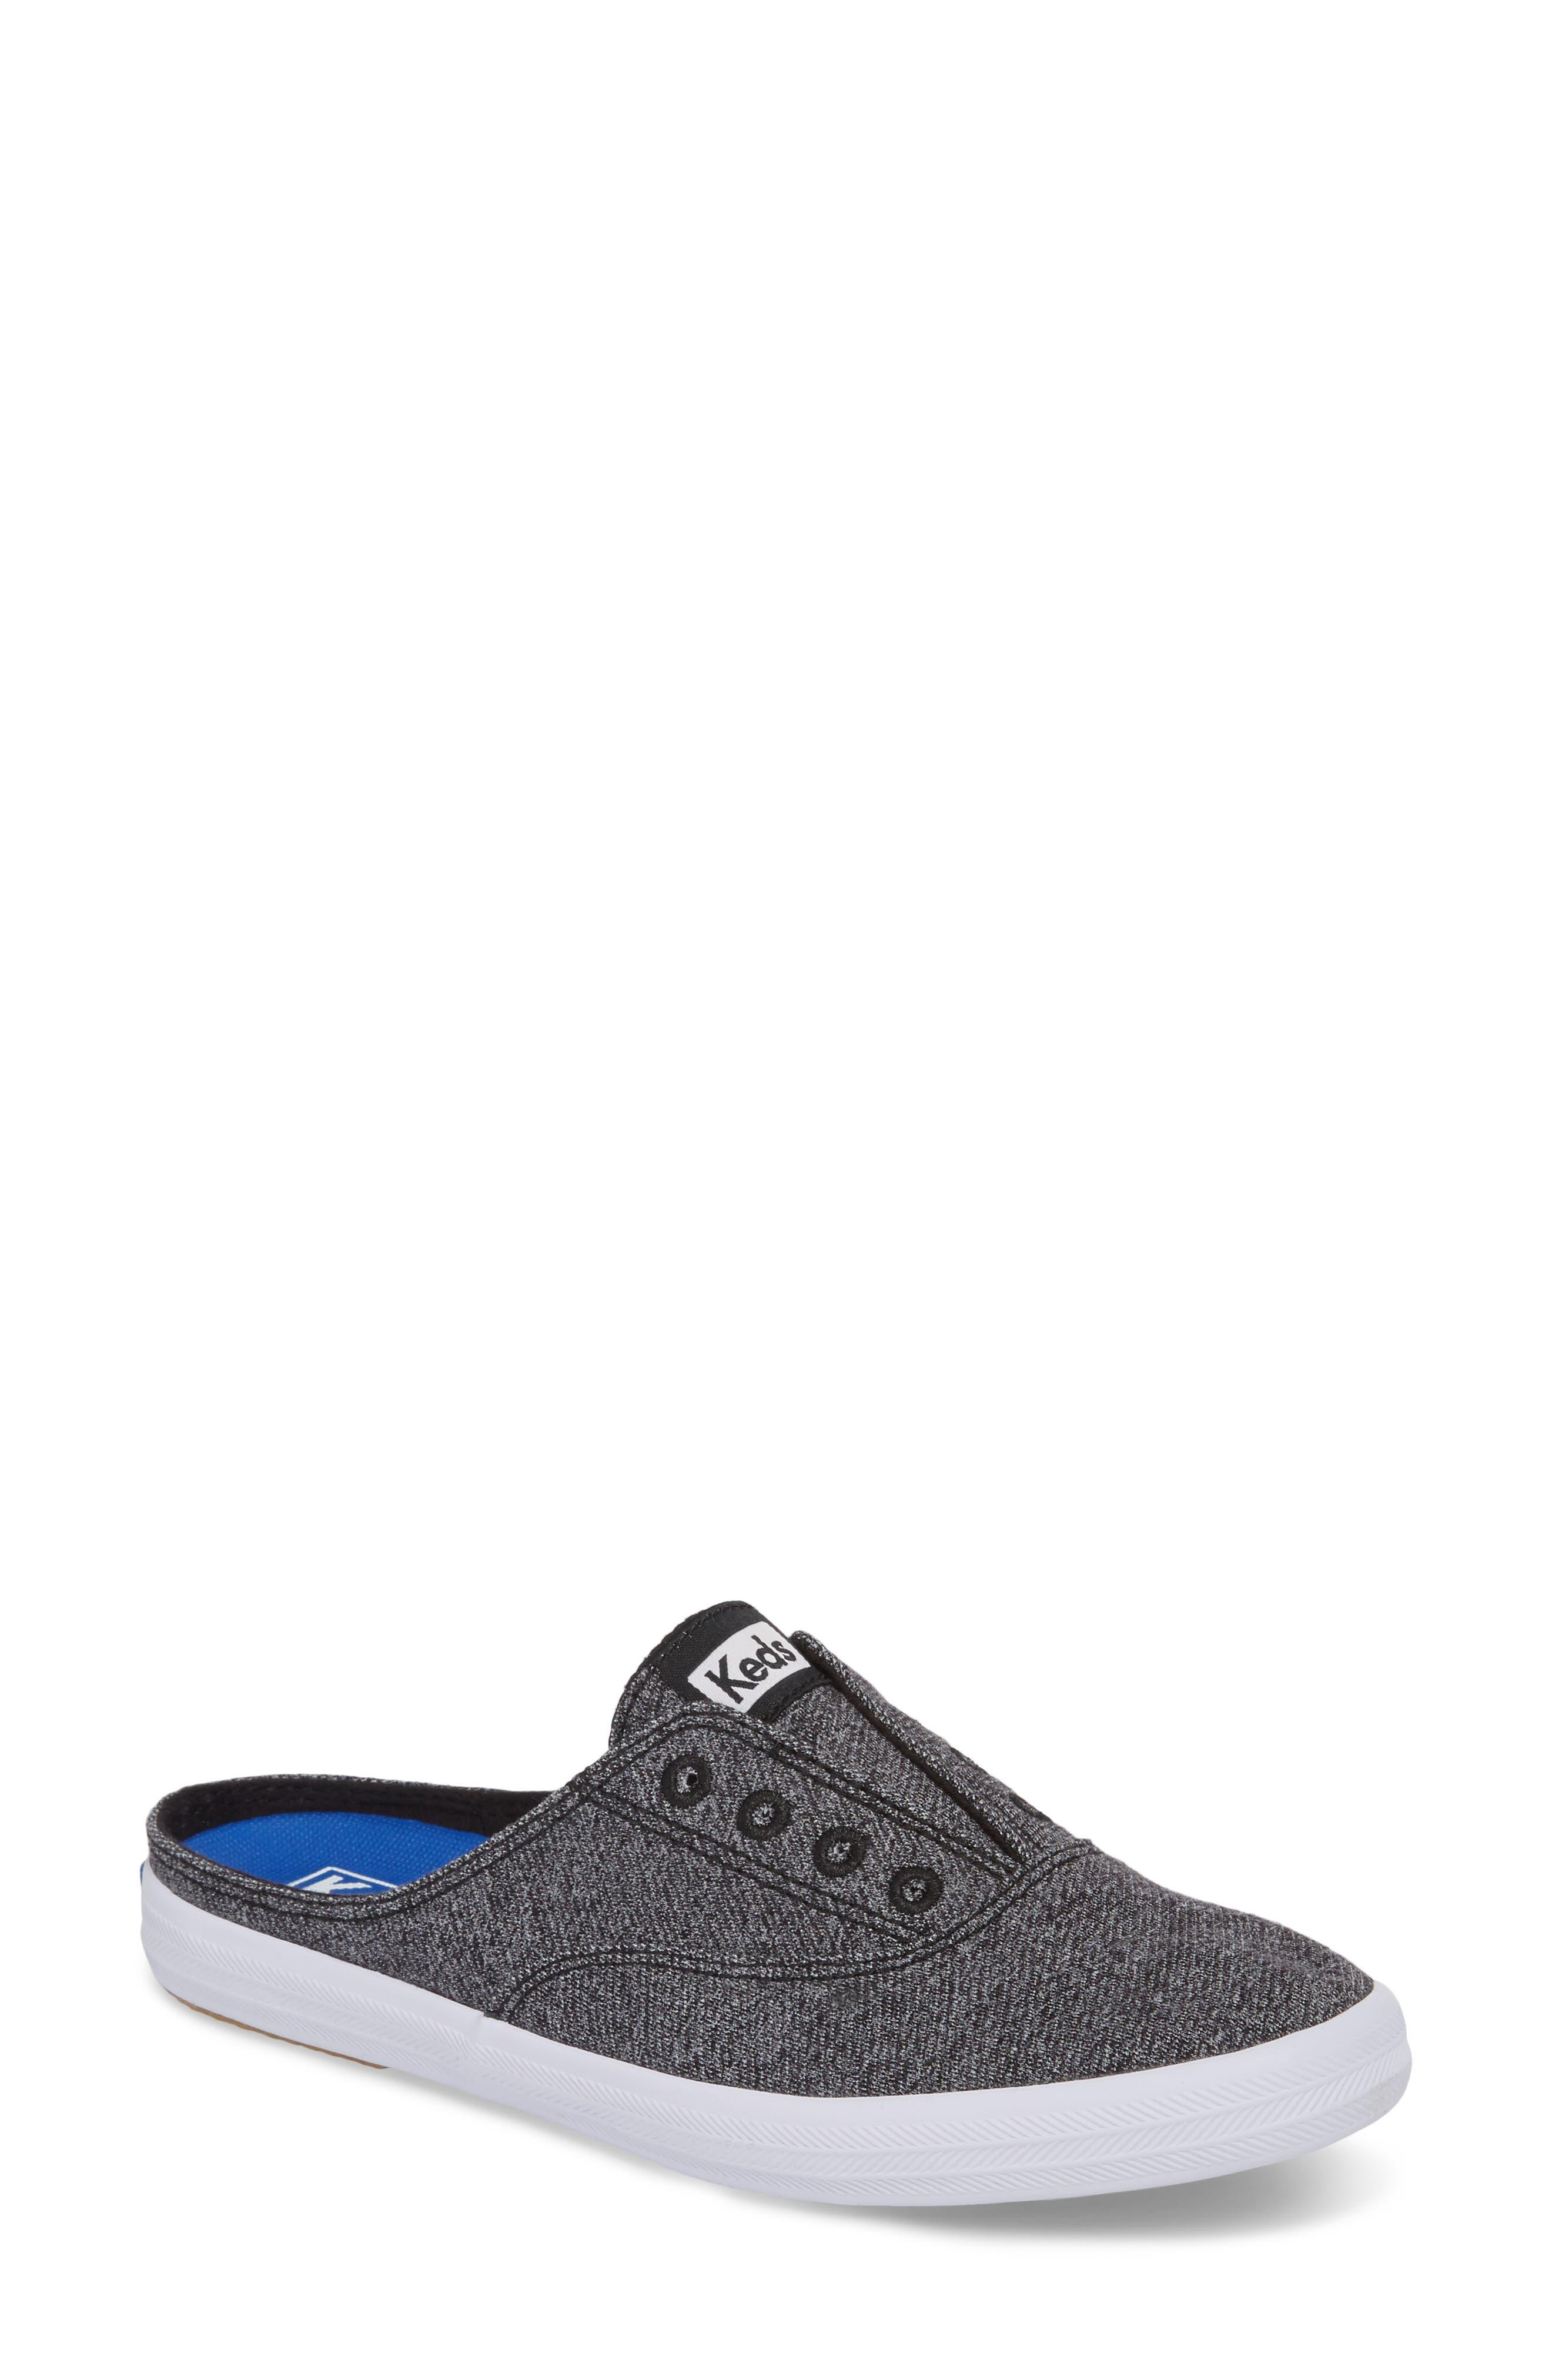 Moxie Sneaker Mule,                         Main,                         color, 021